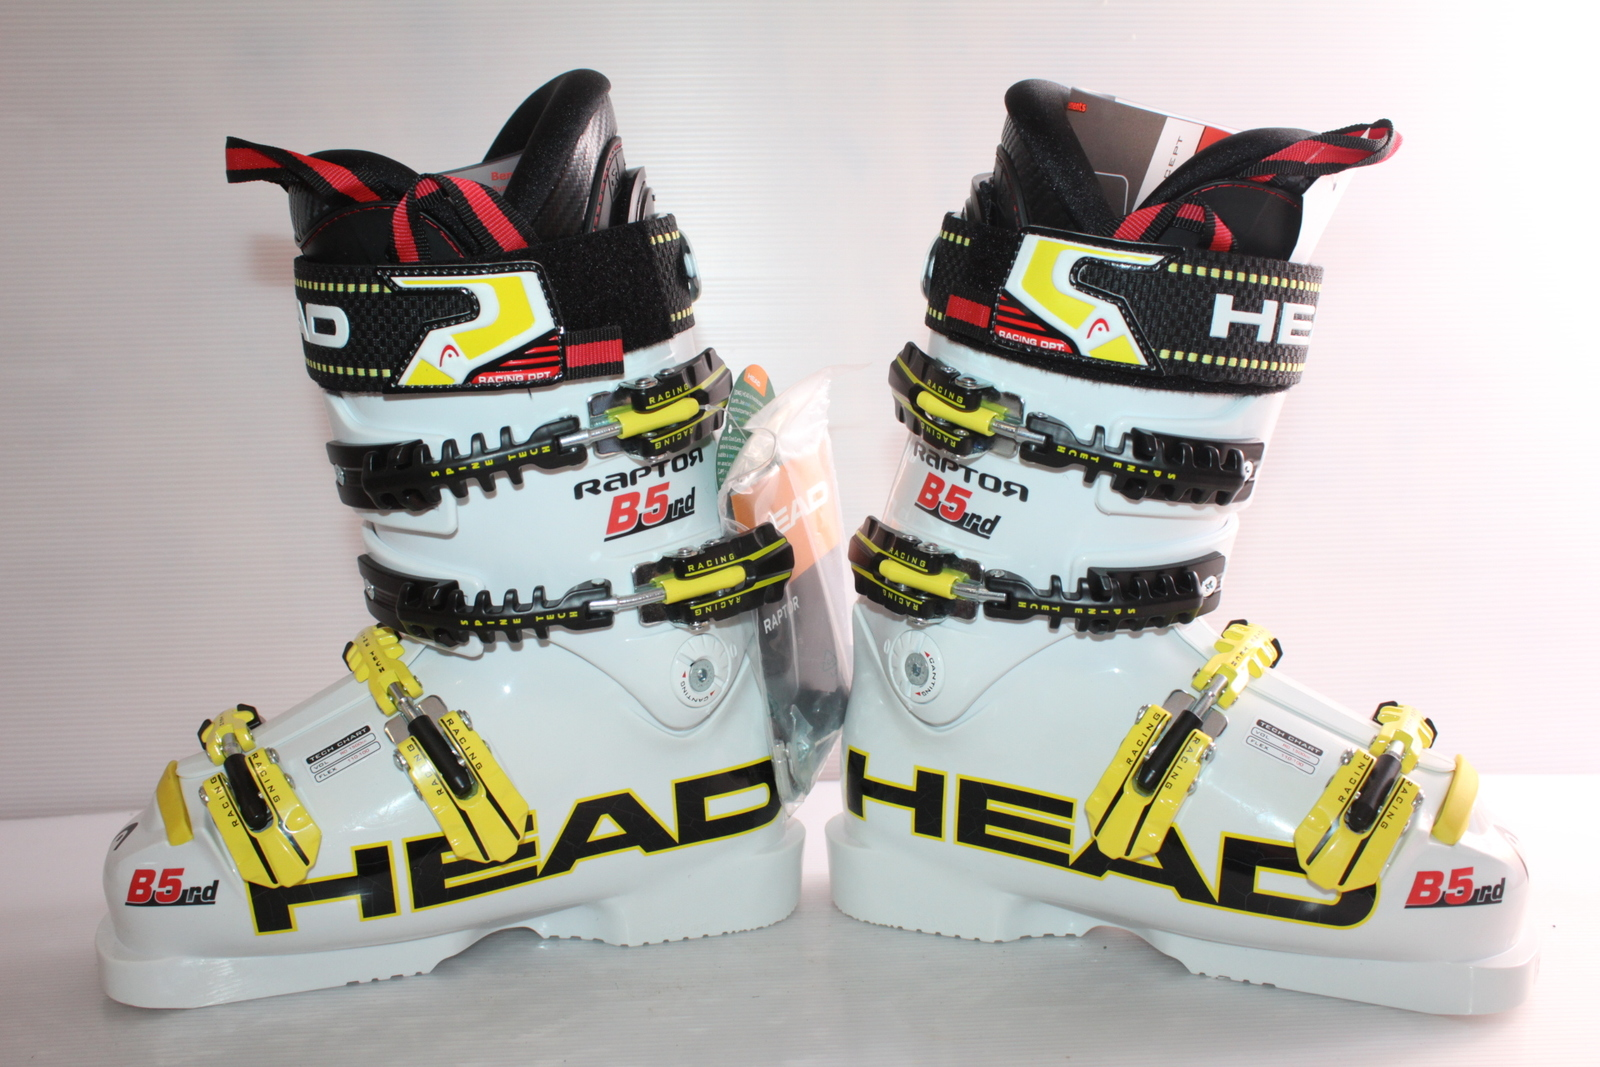 Lyžařské boty Head Raptor B5 rd vel. EU36 flexe 110